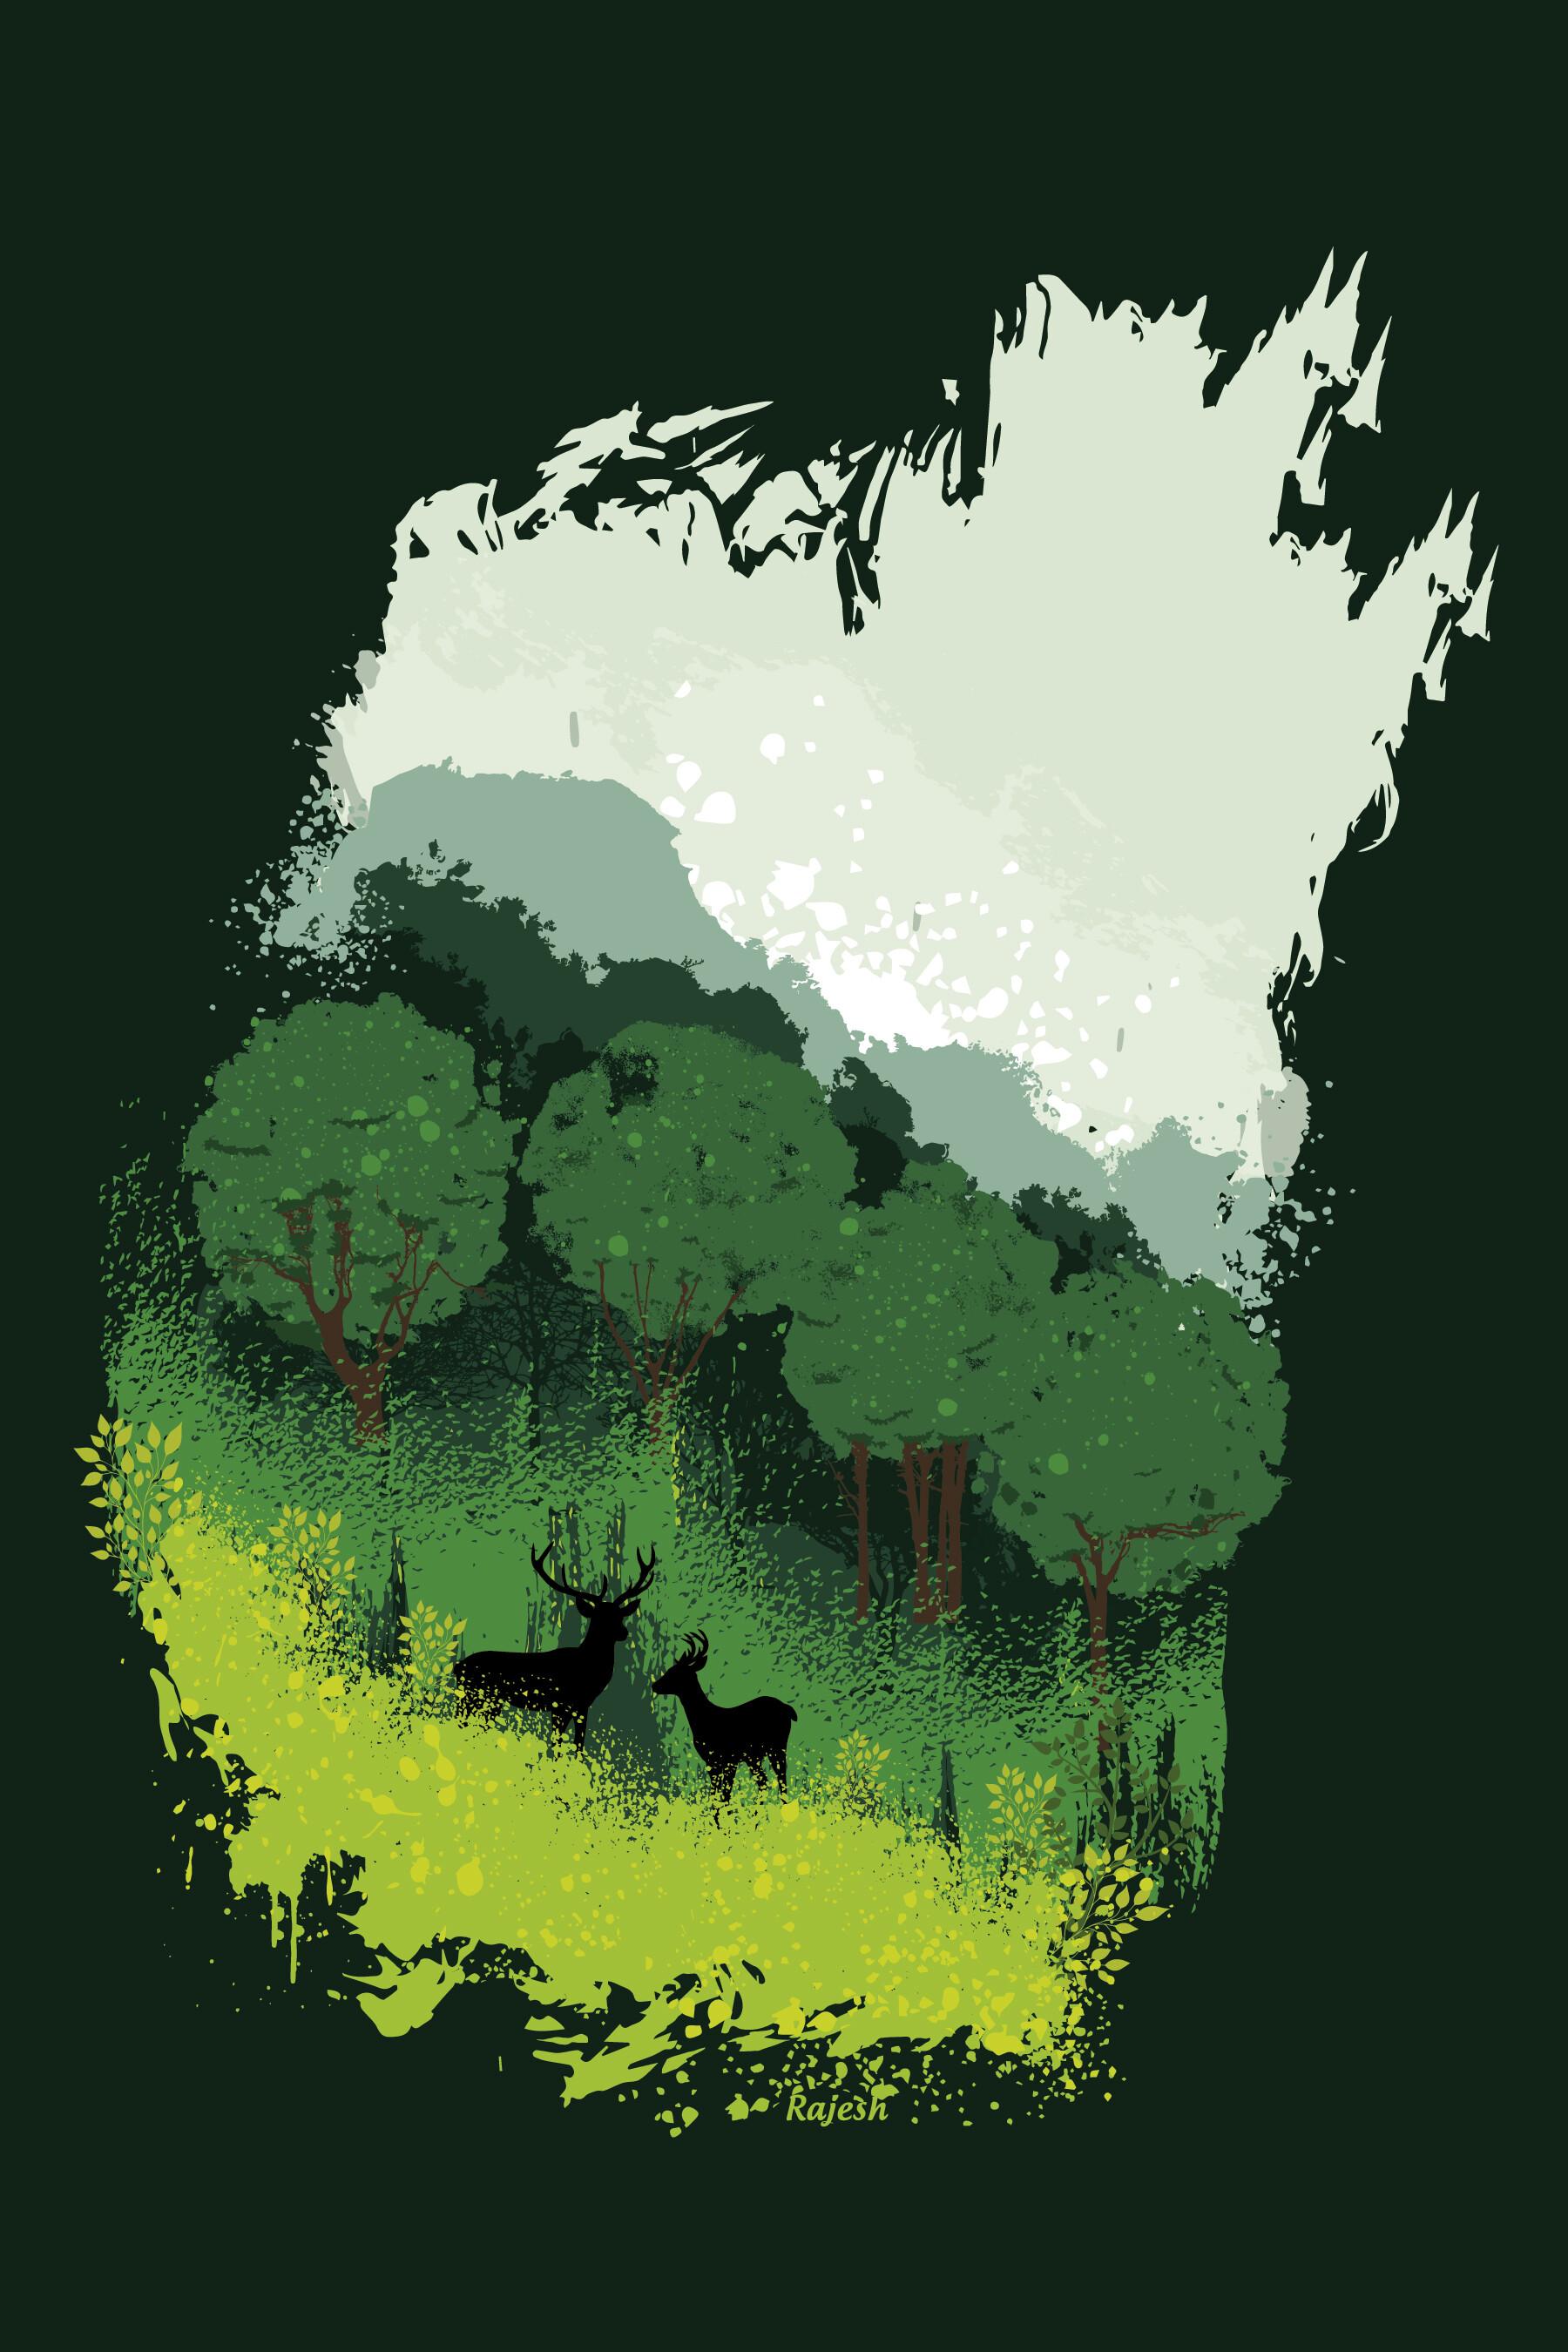 Rajesh r sawant komkan 20 deers